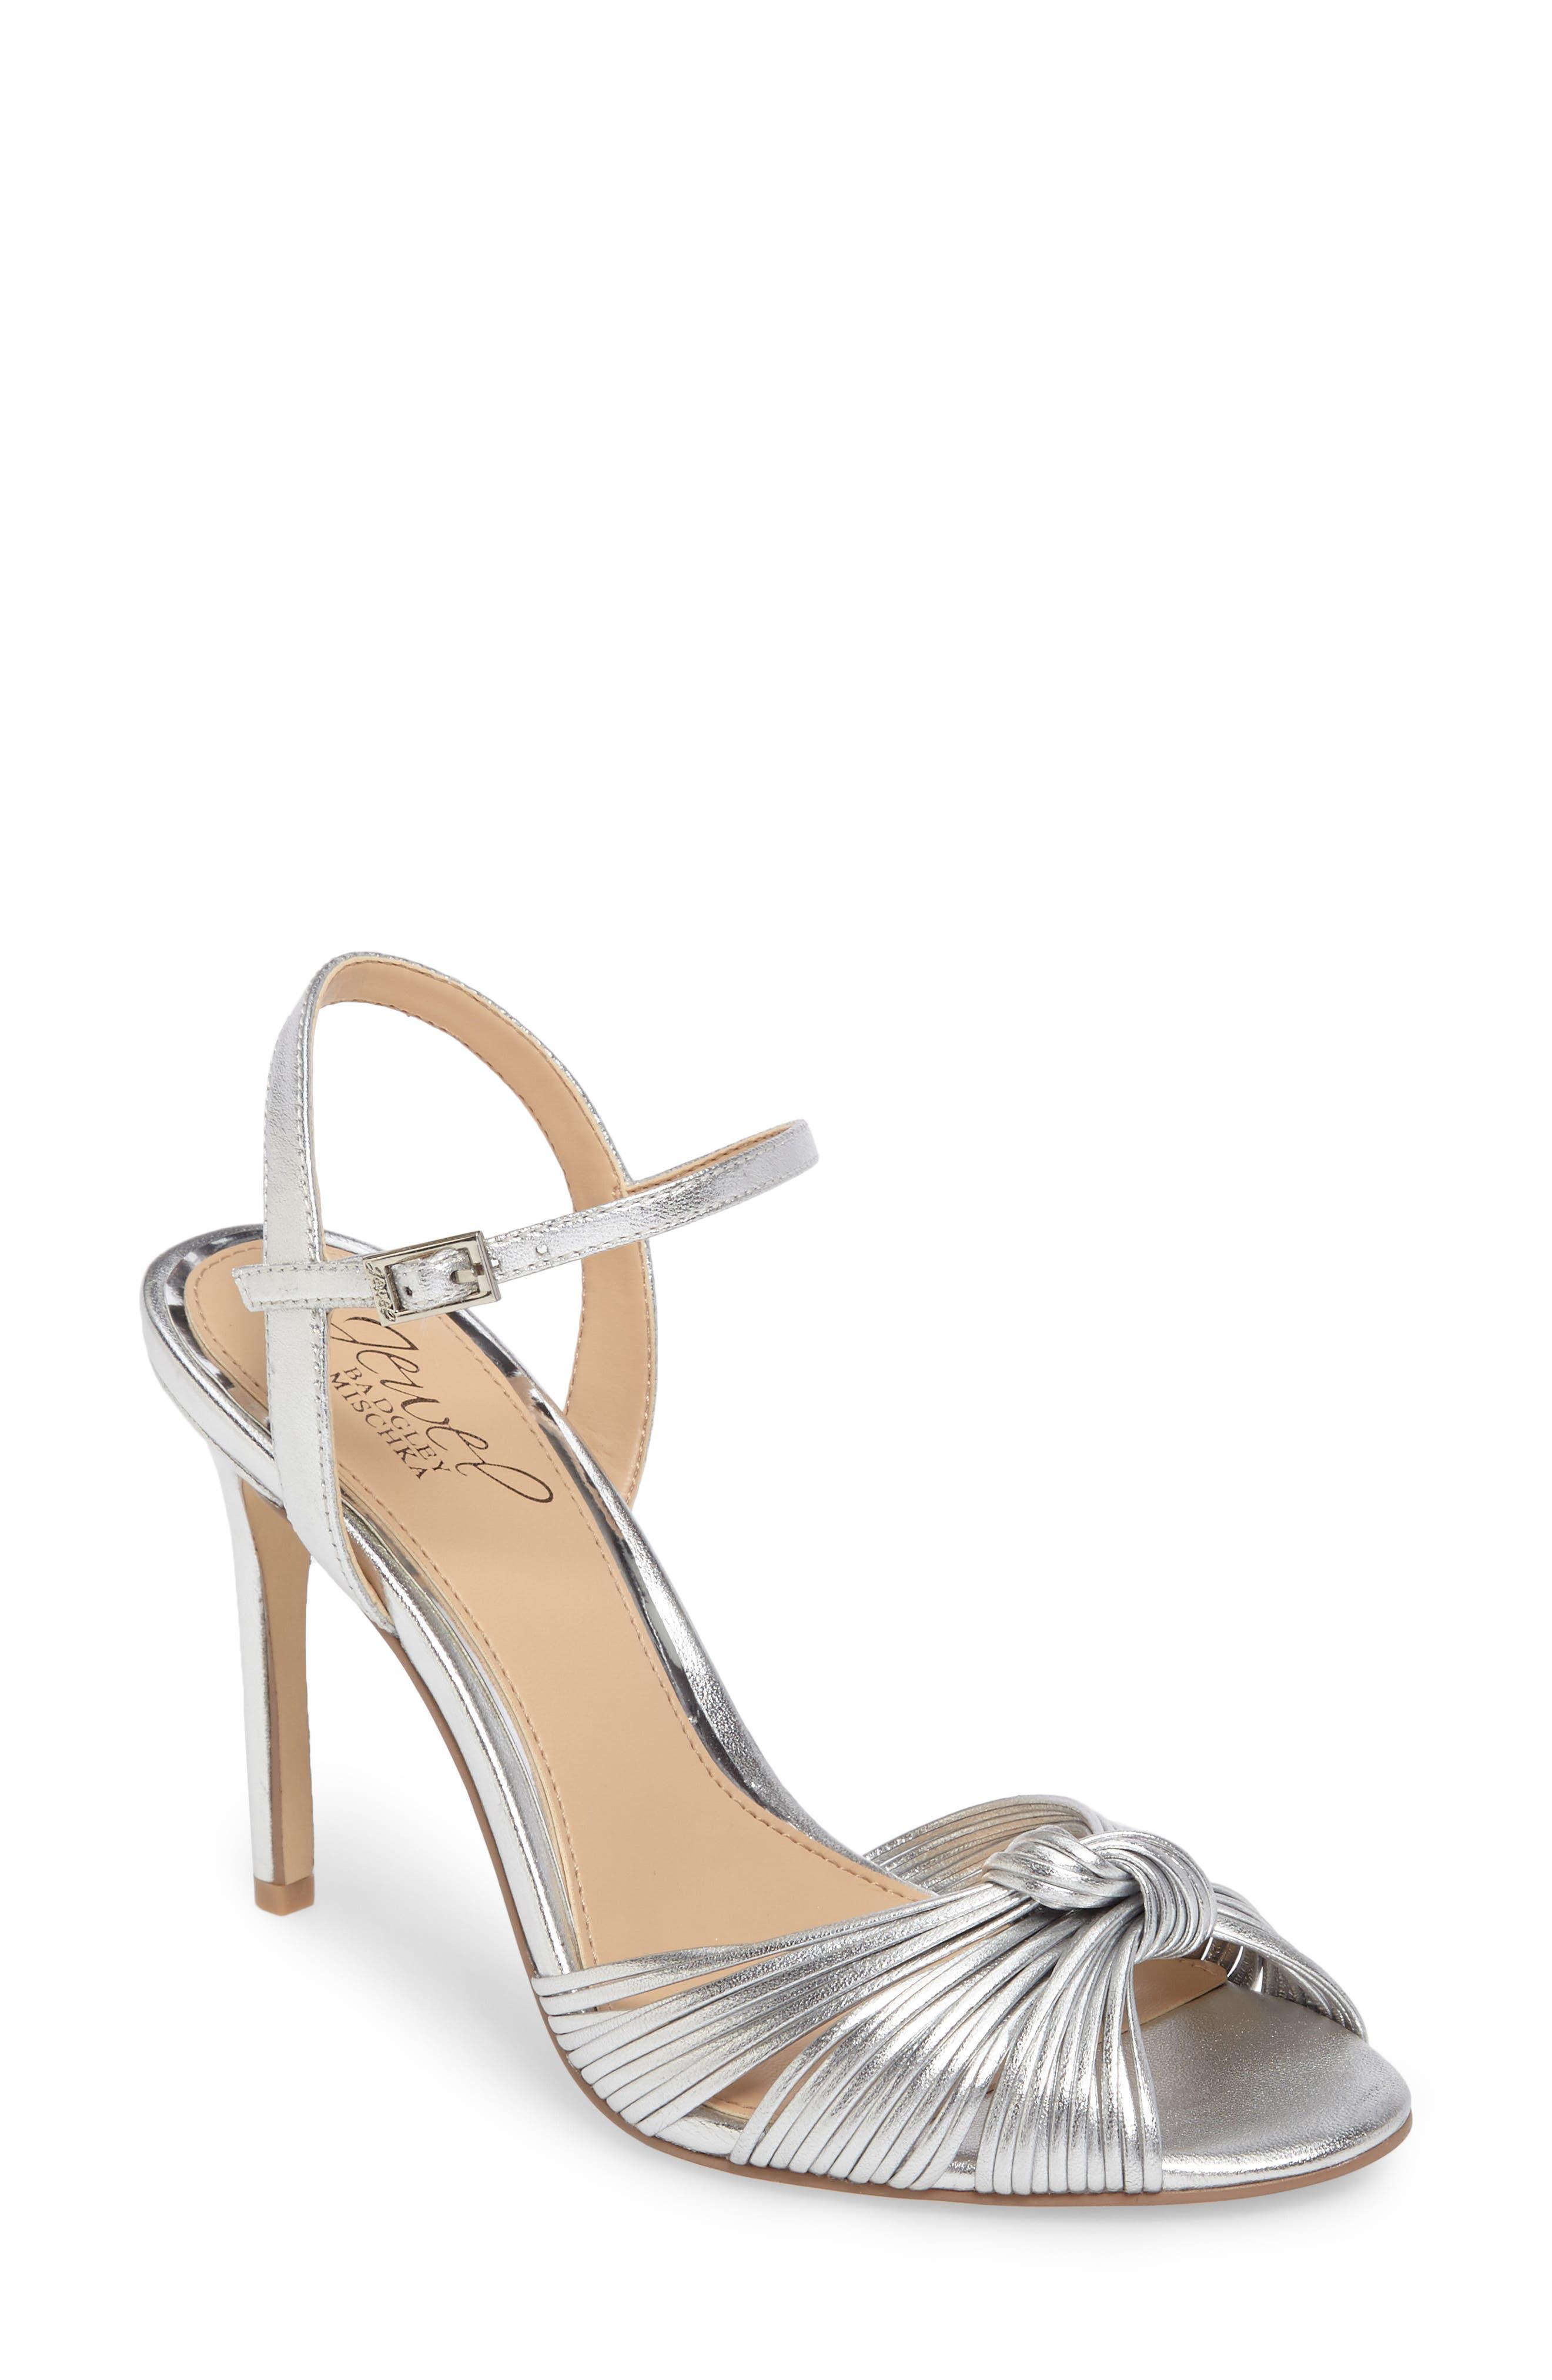 Lady Ankle Strap Sandal,                             Main thumbnail 1, color,                             046